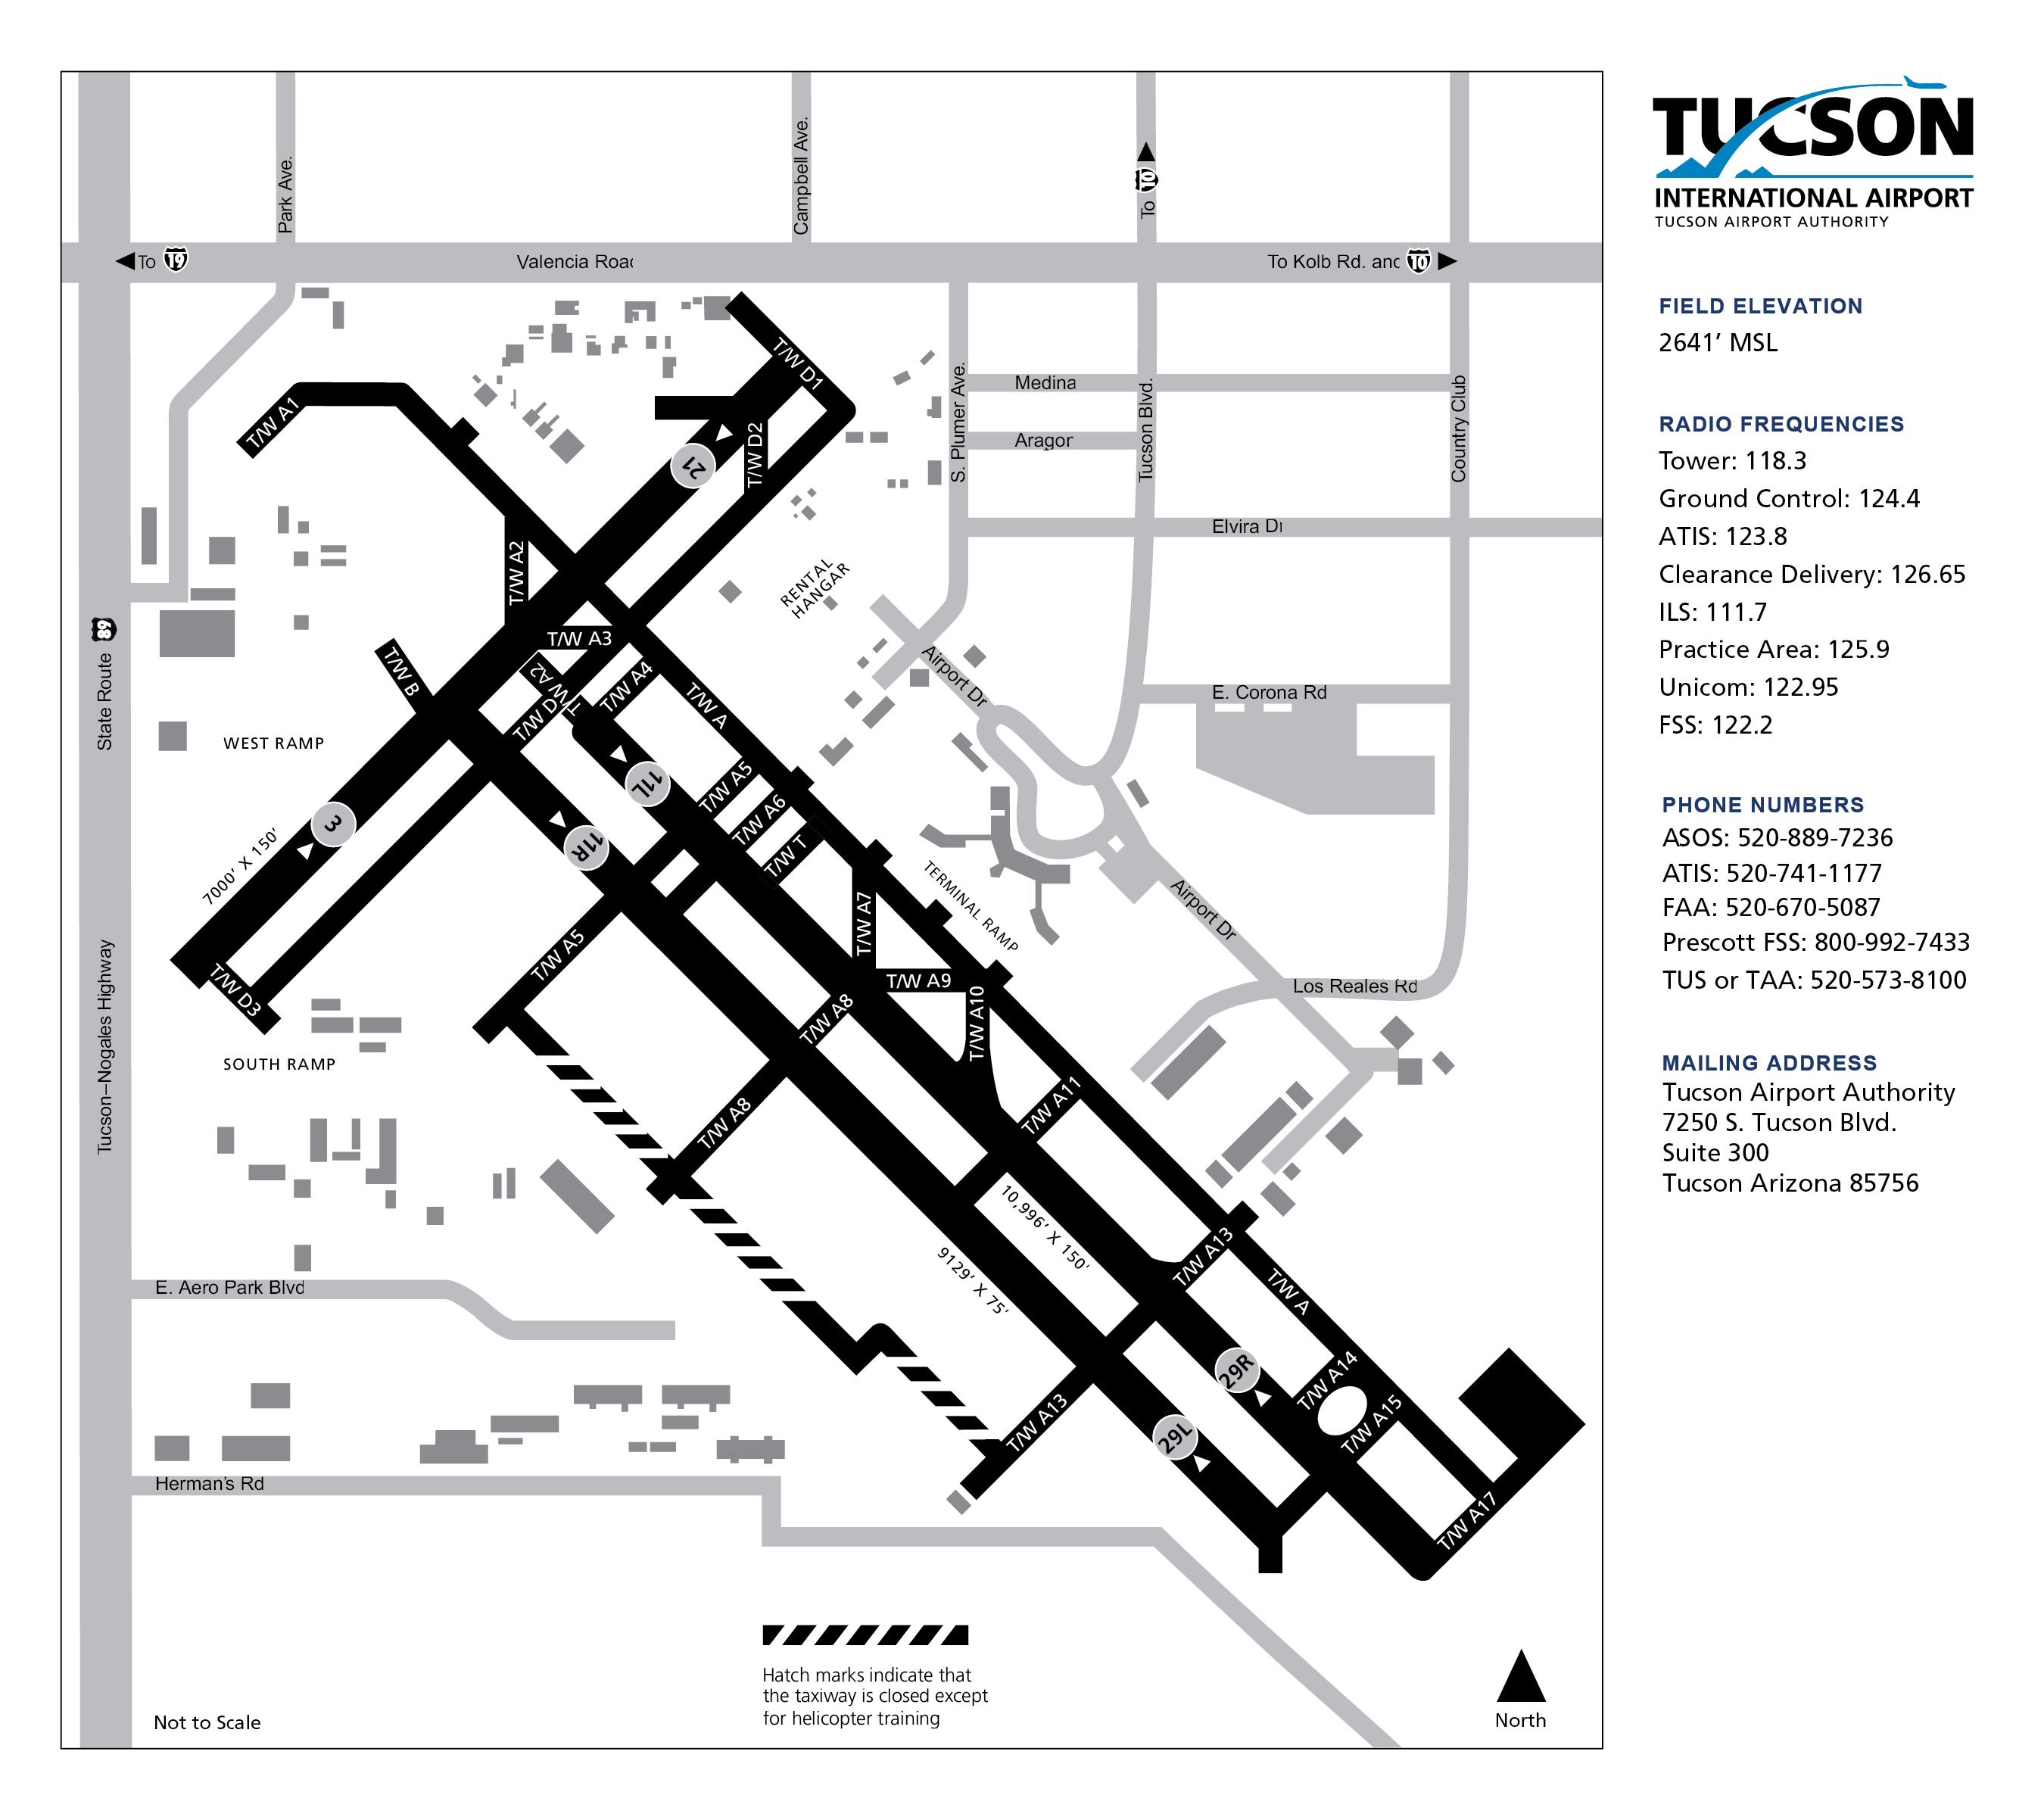 Economic Development Opportunities At Tucson S Airports